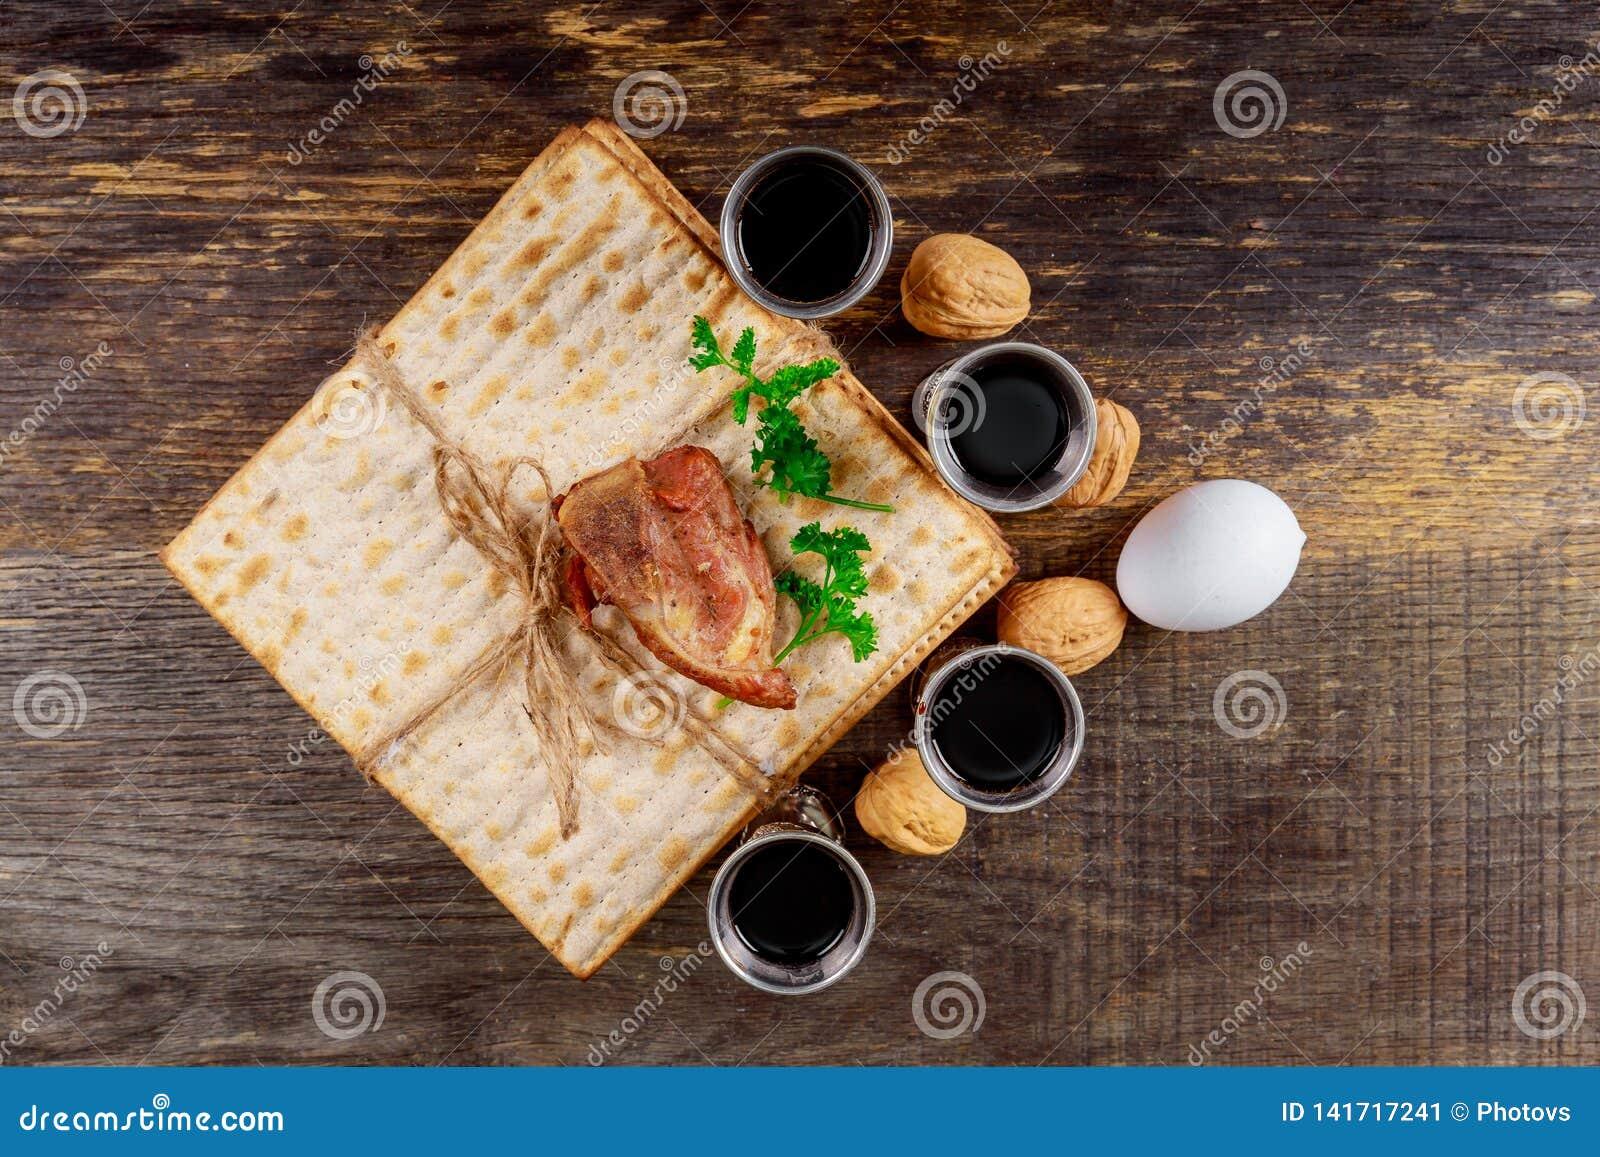 Vino kosher rojo cuatro del Haggadah del matzah o de la pascua judía del matza